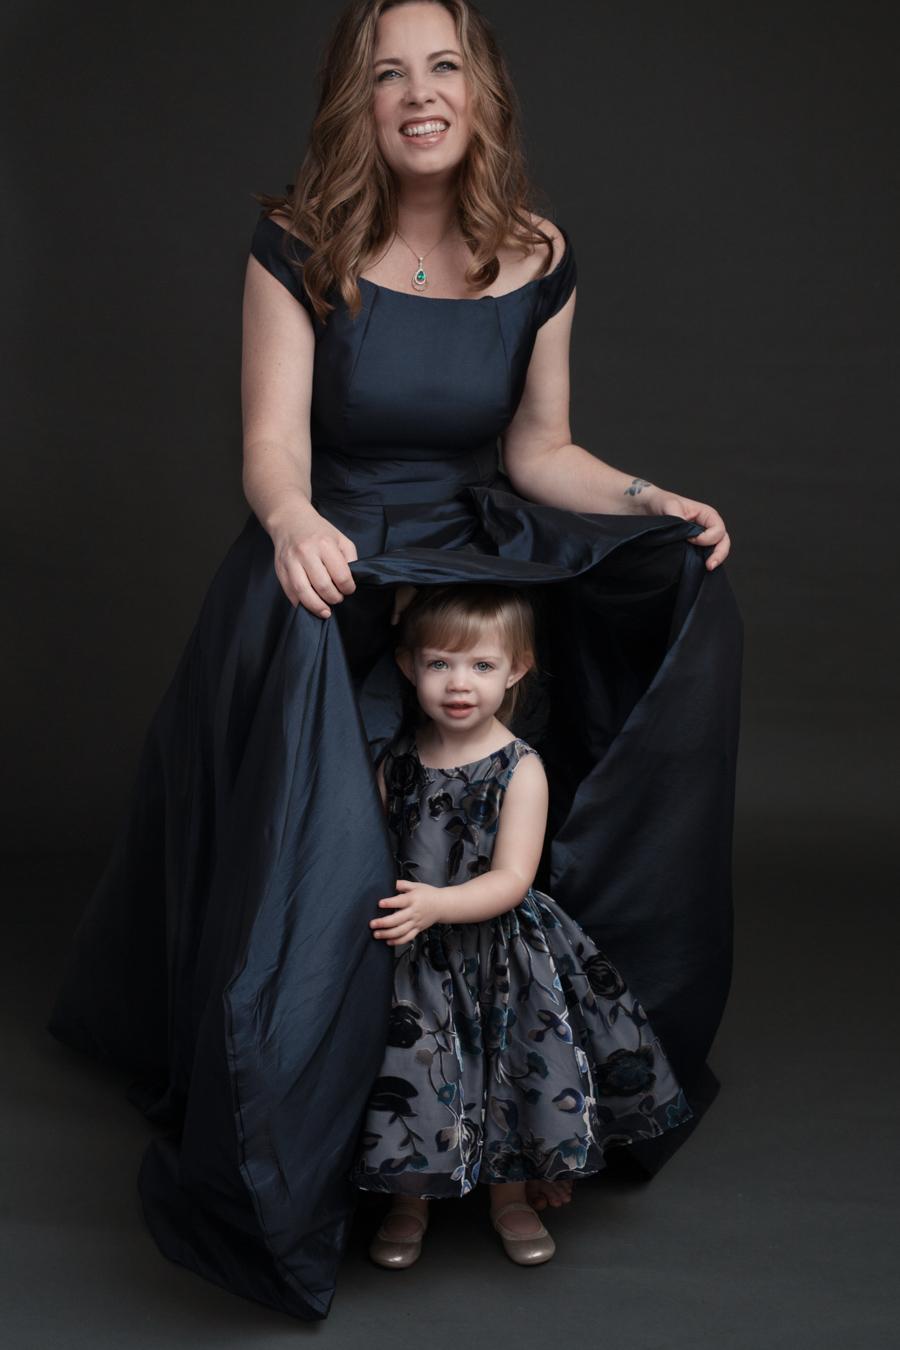 anna_kraft_photography_georgetown_square_studio_family_portrait_austin_photo-3.jpg